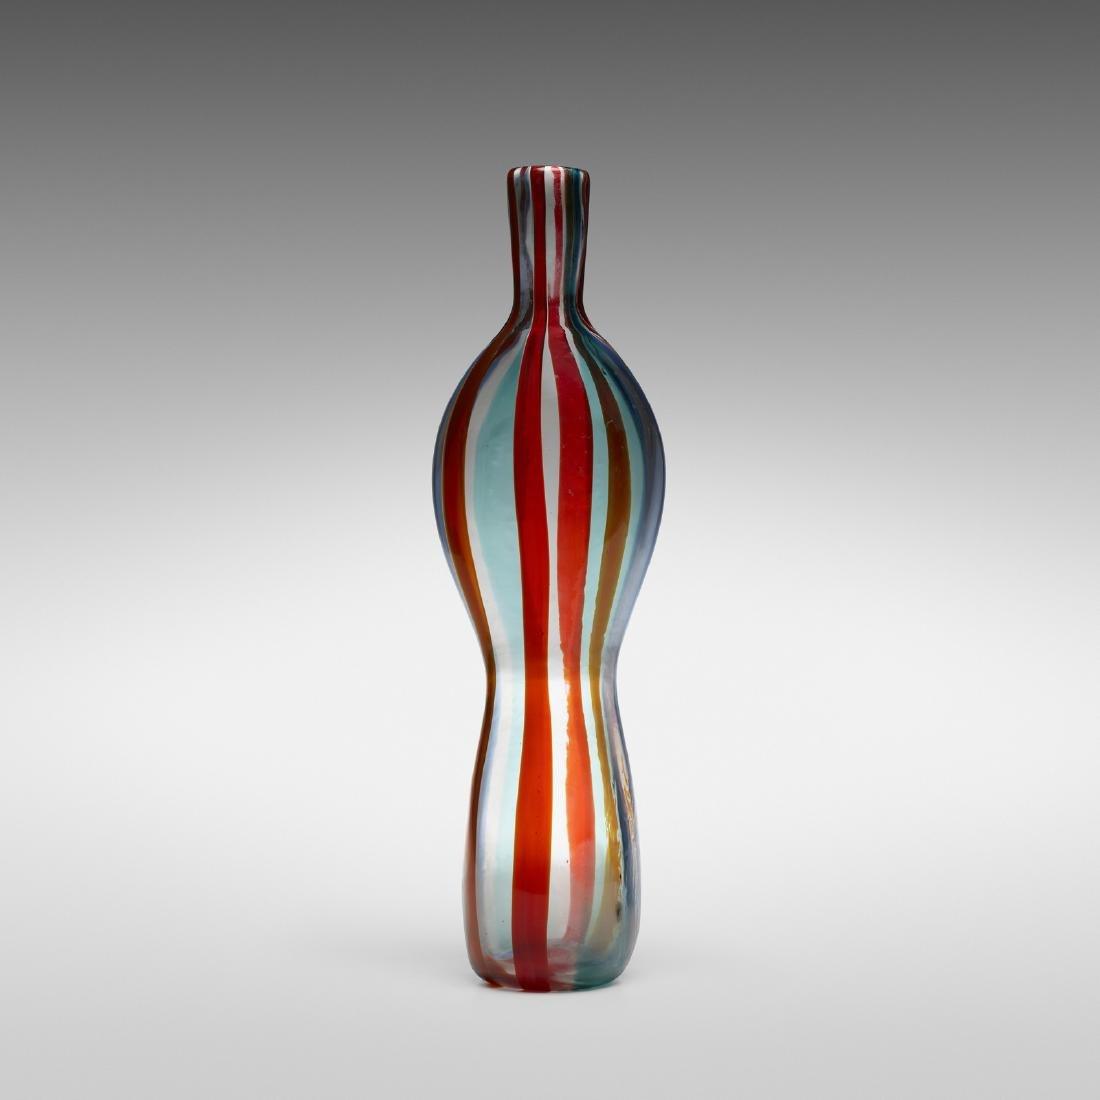 Fulvio Bianconi, Fasce Verticale bottle, model 4404